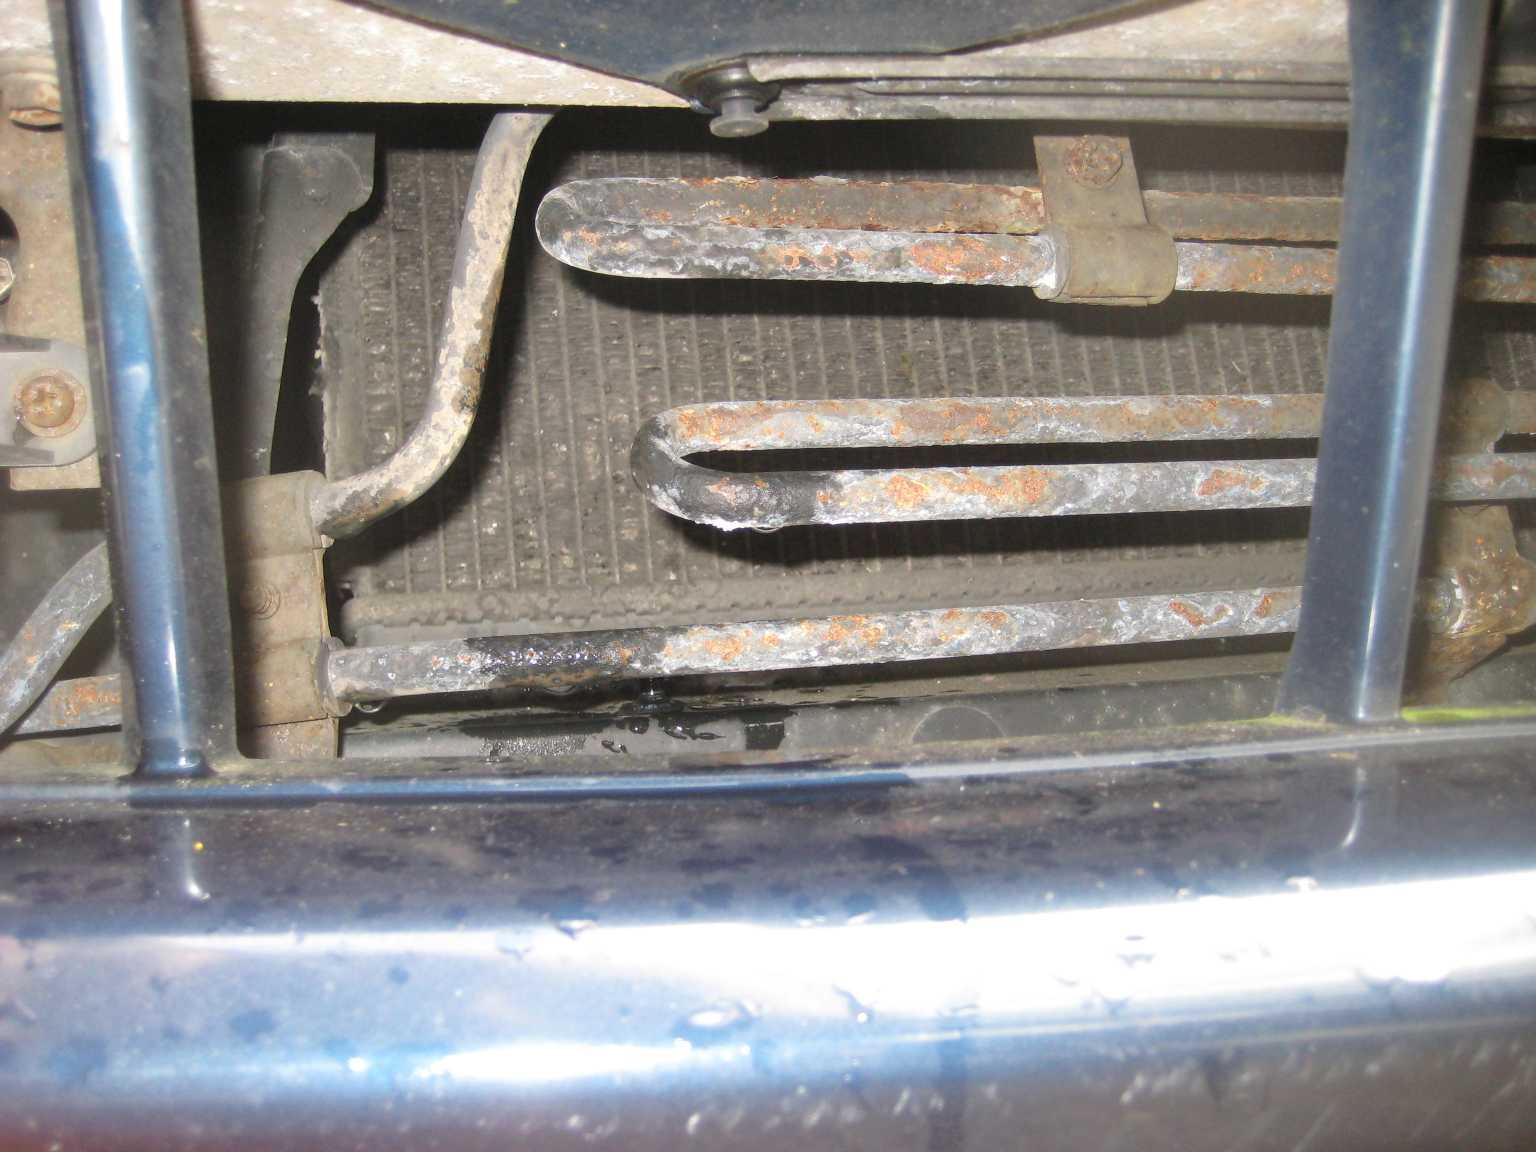 Celica steering fluid cooler pipe corrosion.